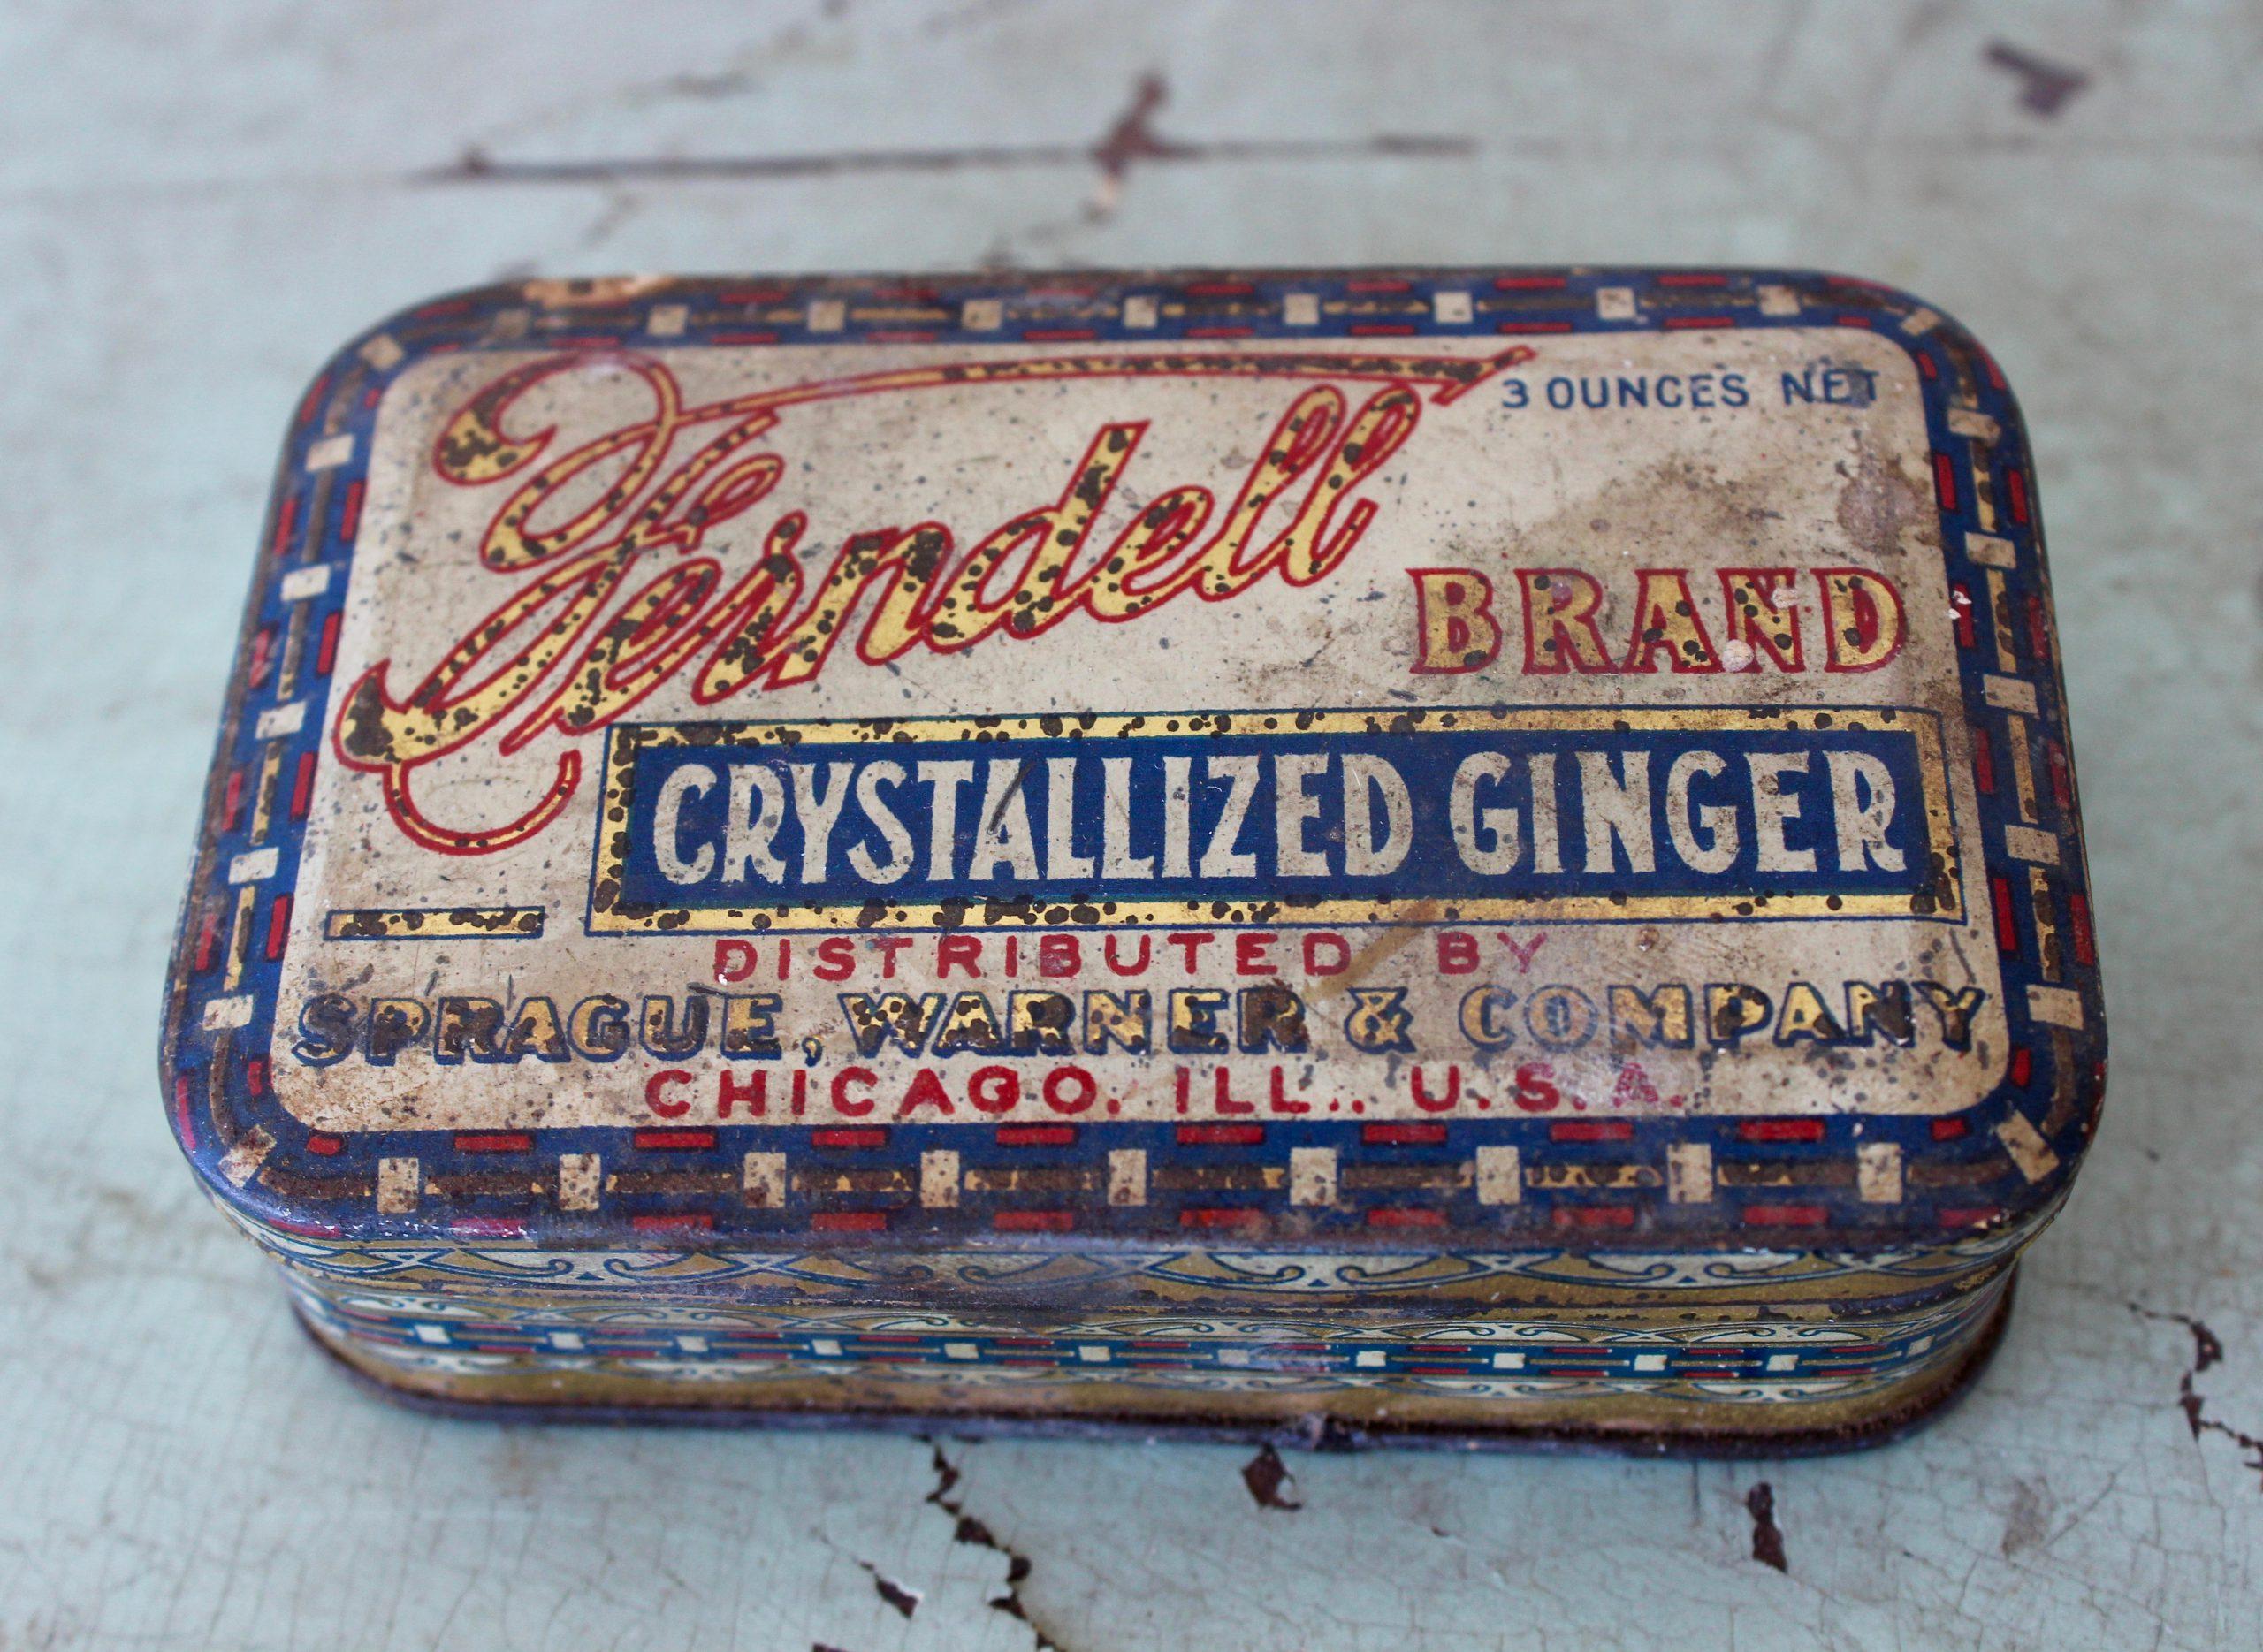 Ferndell History - Sprague Warner & Company